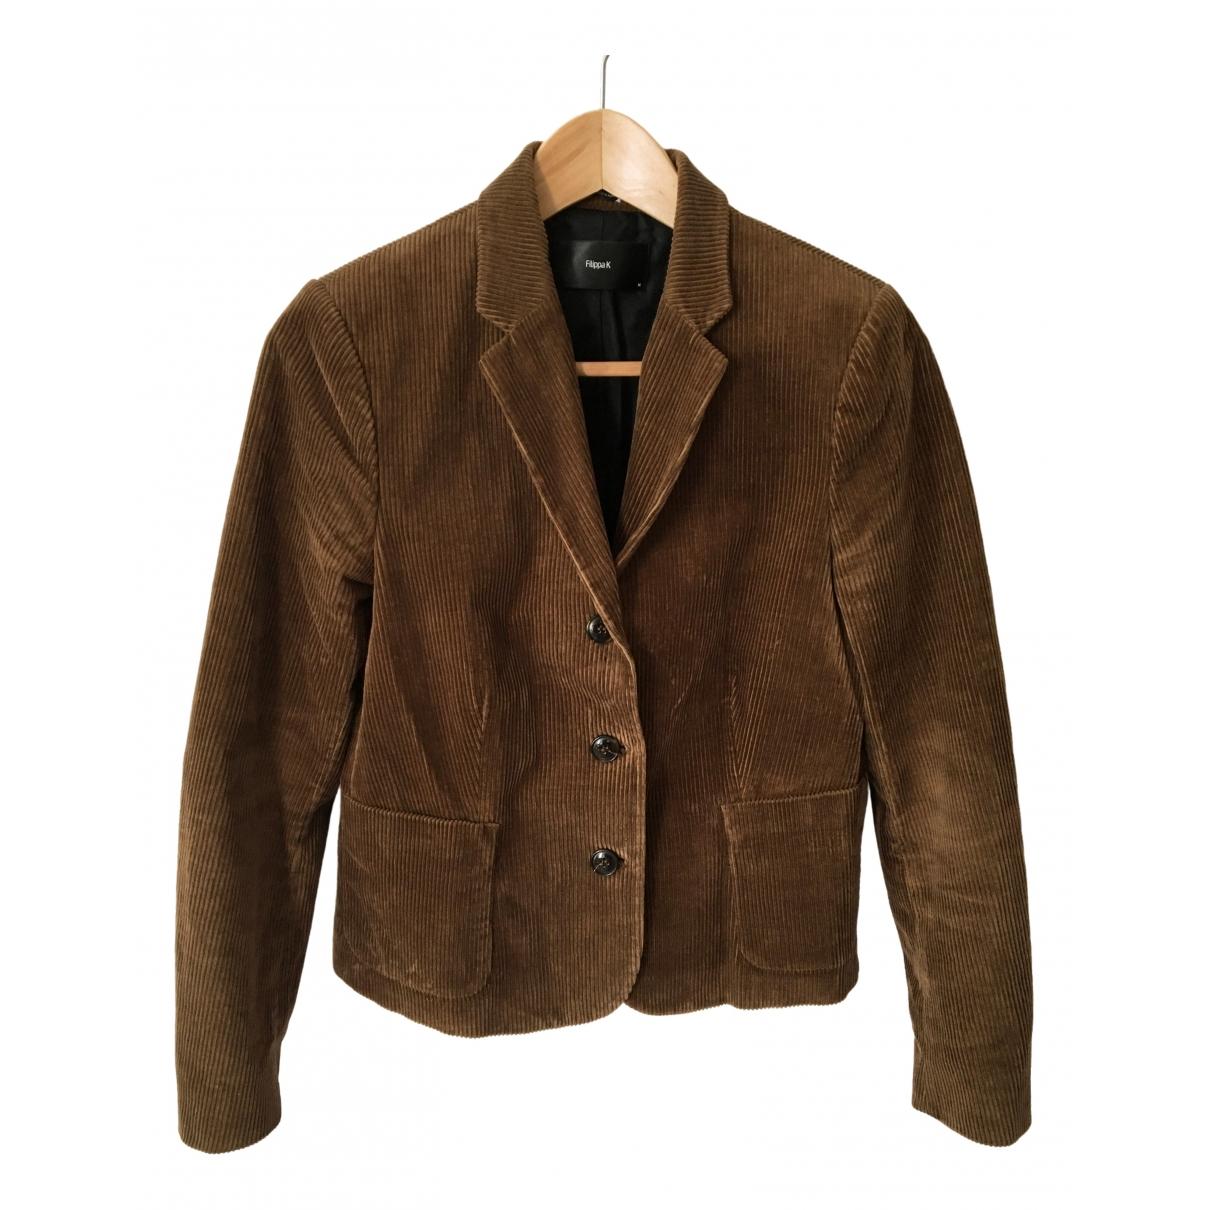 Filippa K \N Brown Cotton jacket for Women M International